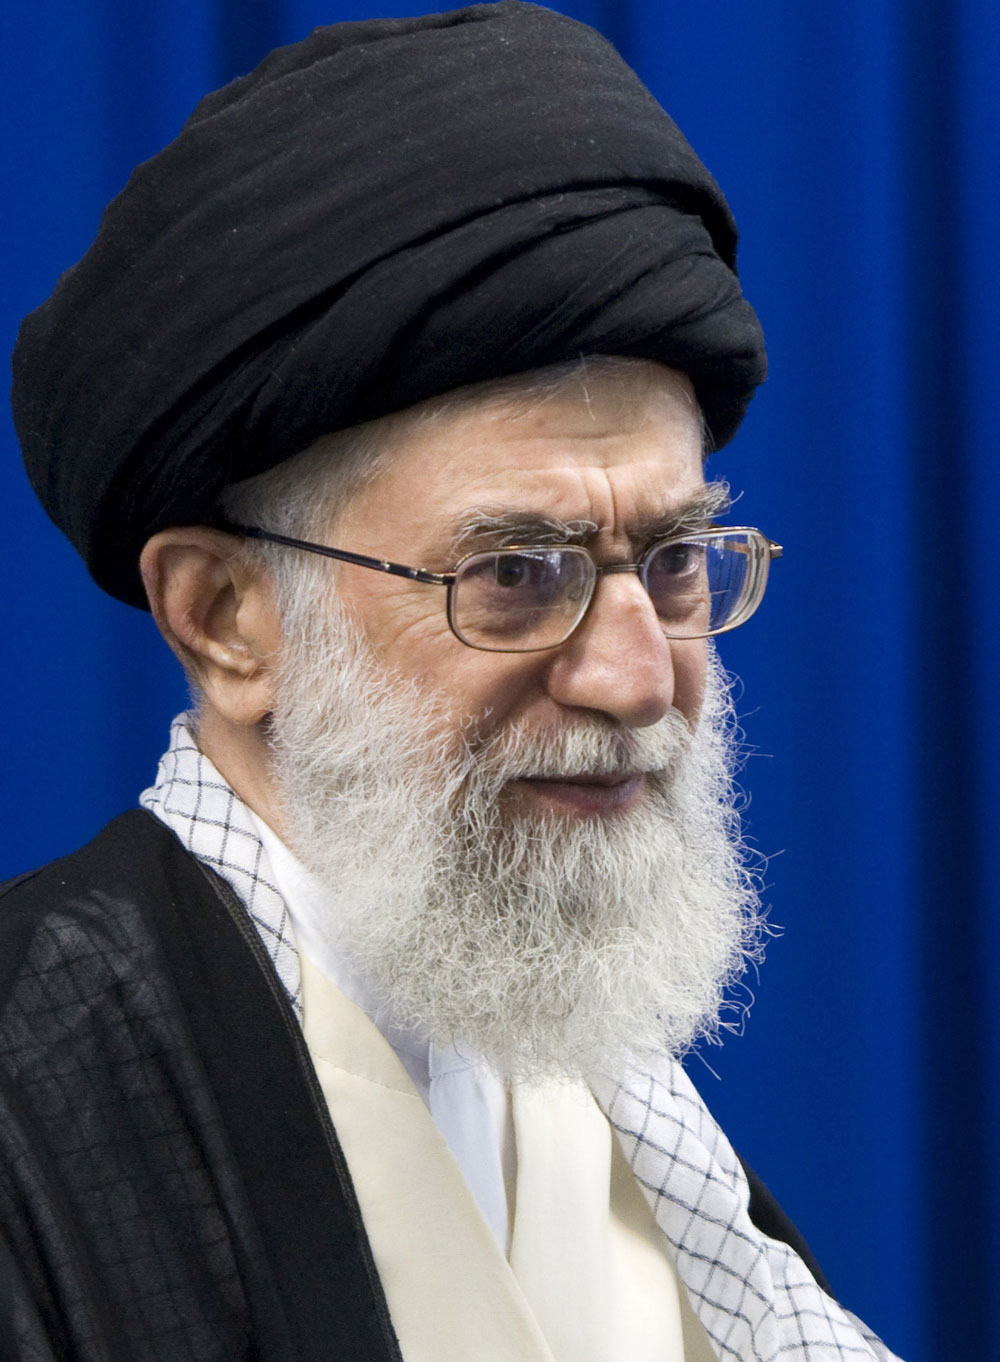 Iran slams US ahead of sanctions